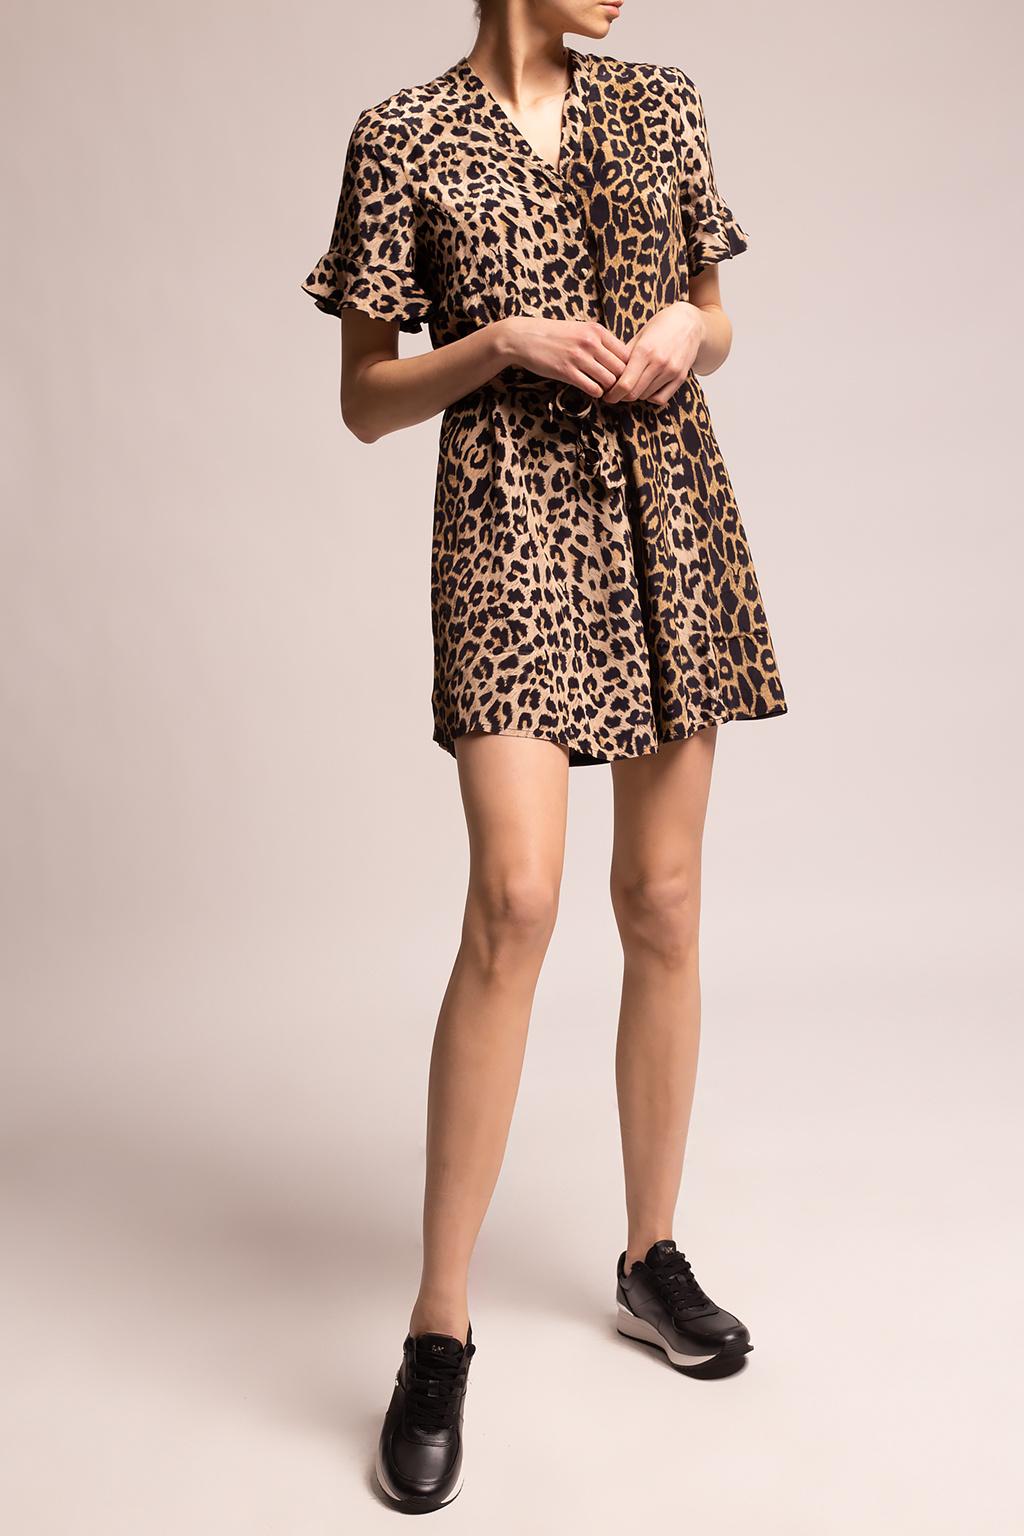 AllSaints 'Fay' dress